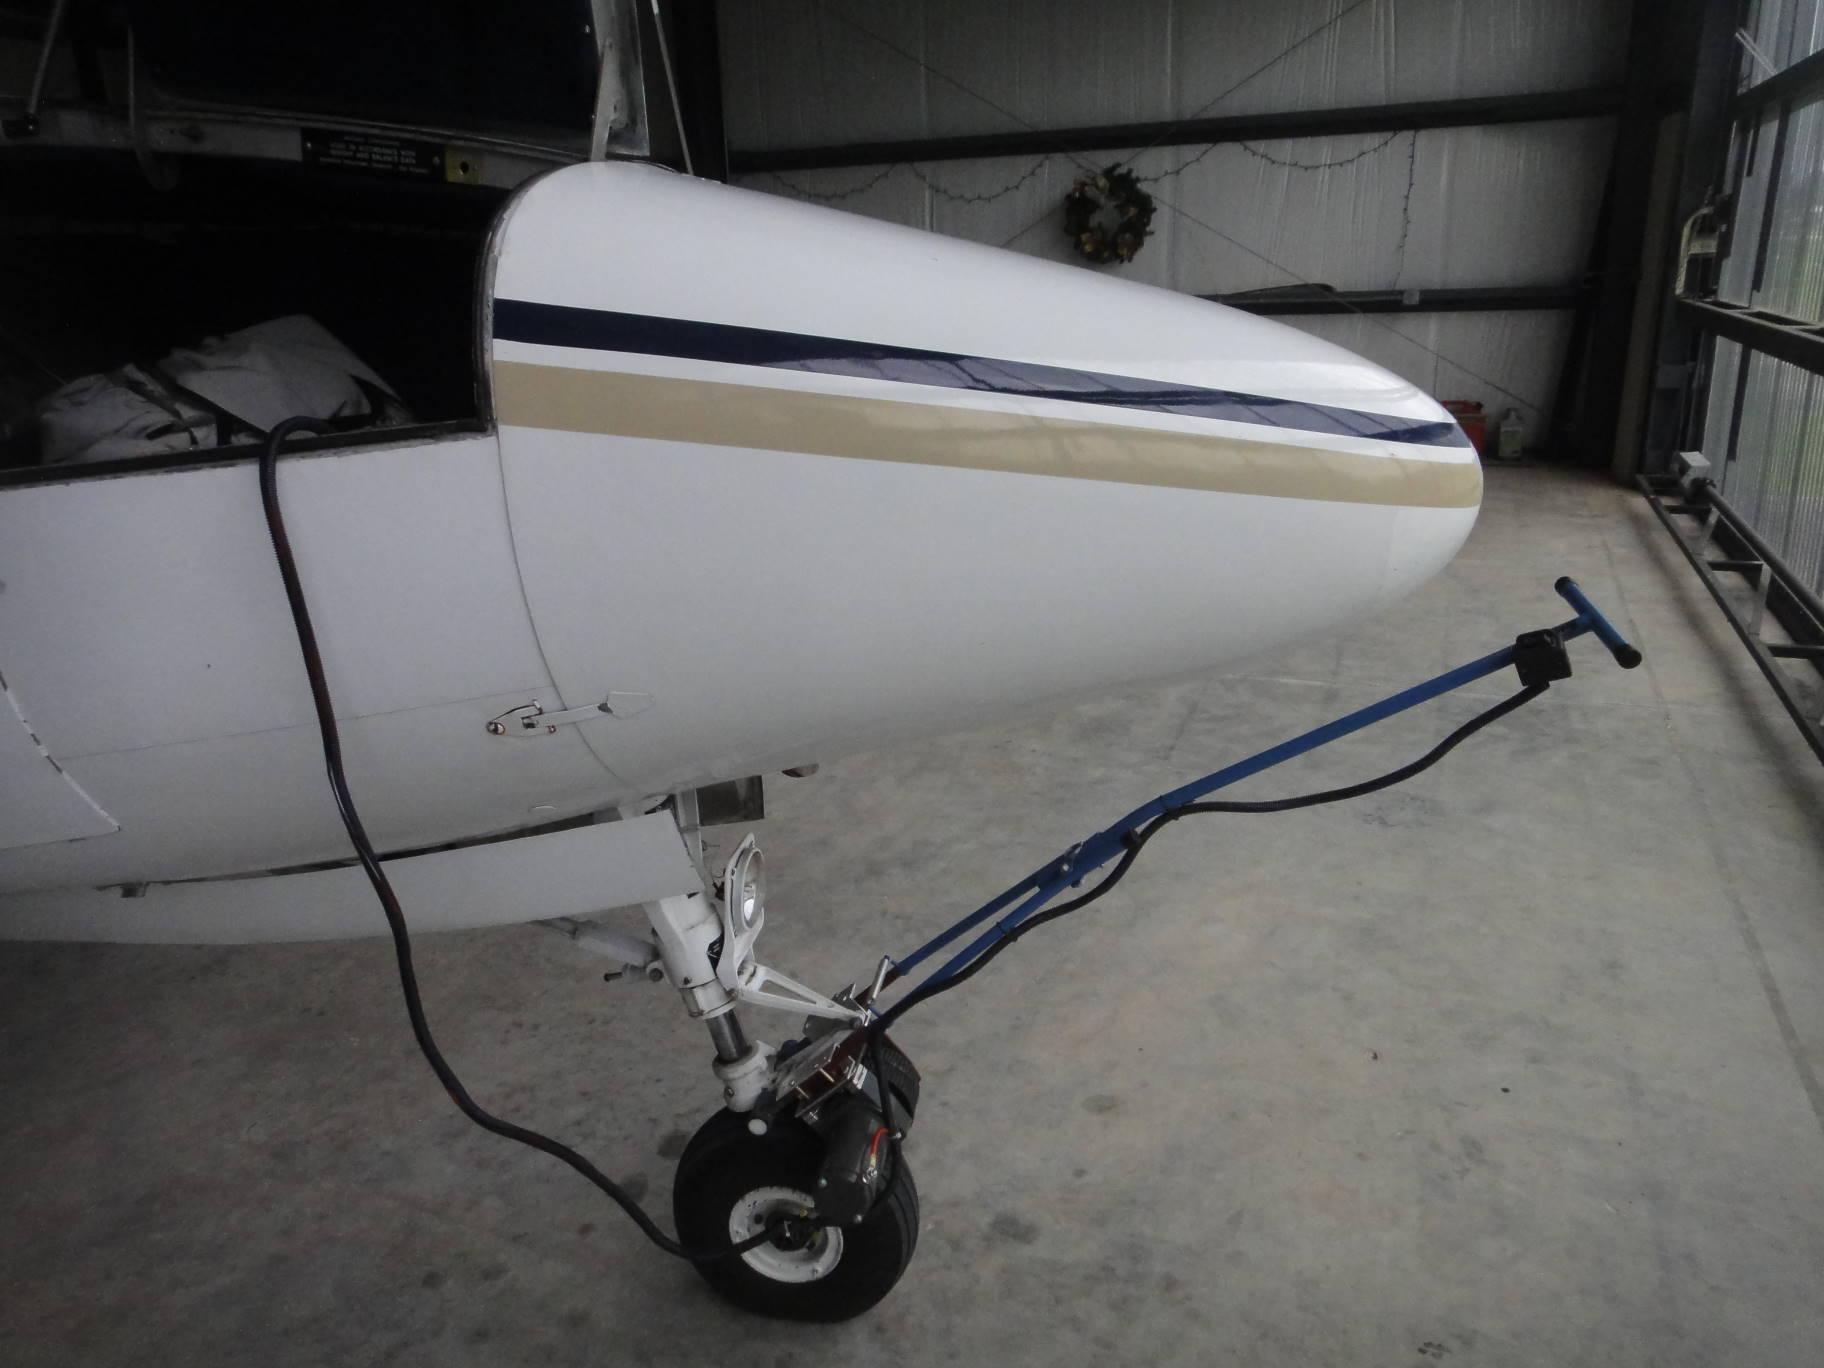 As mounted on Baron airframe - ready to go!